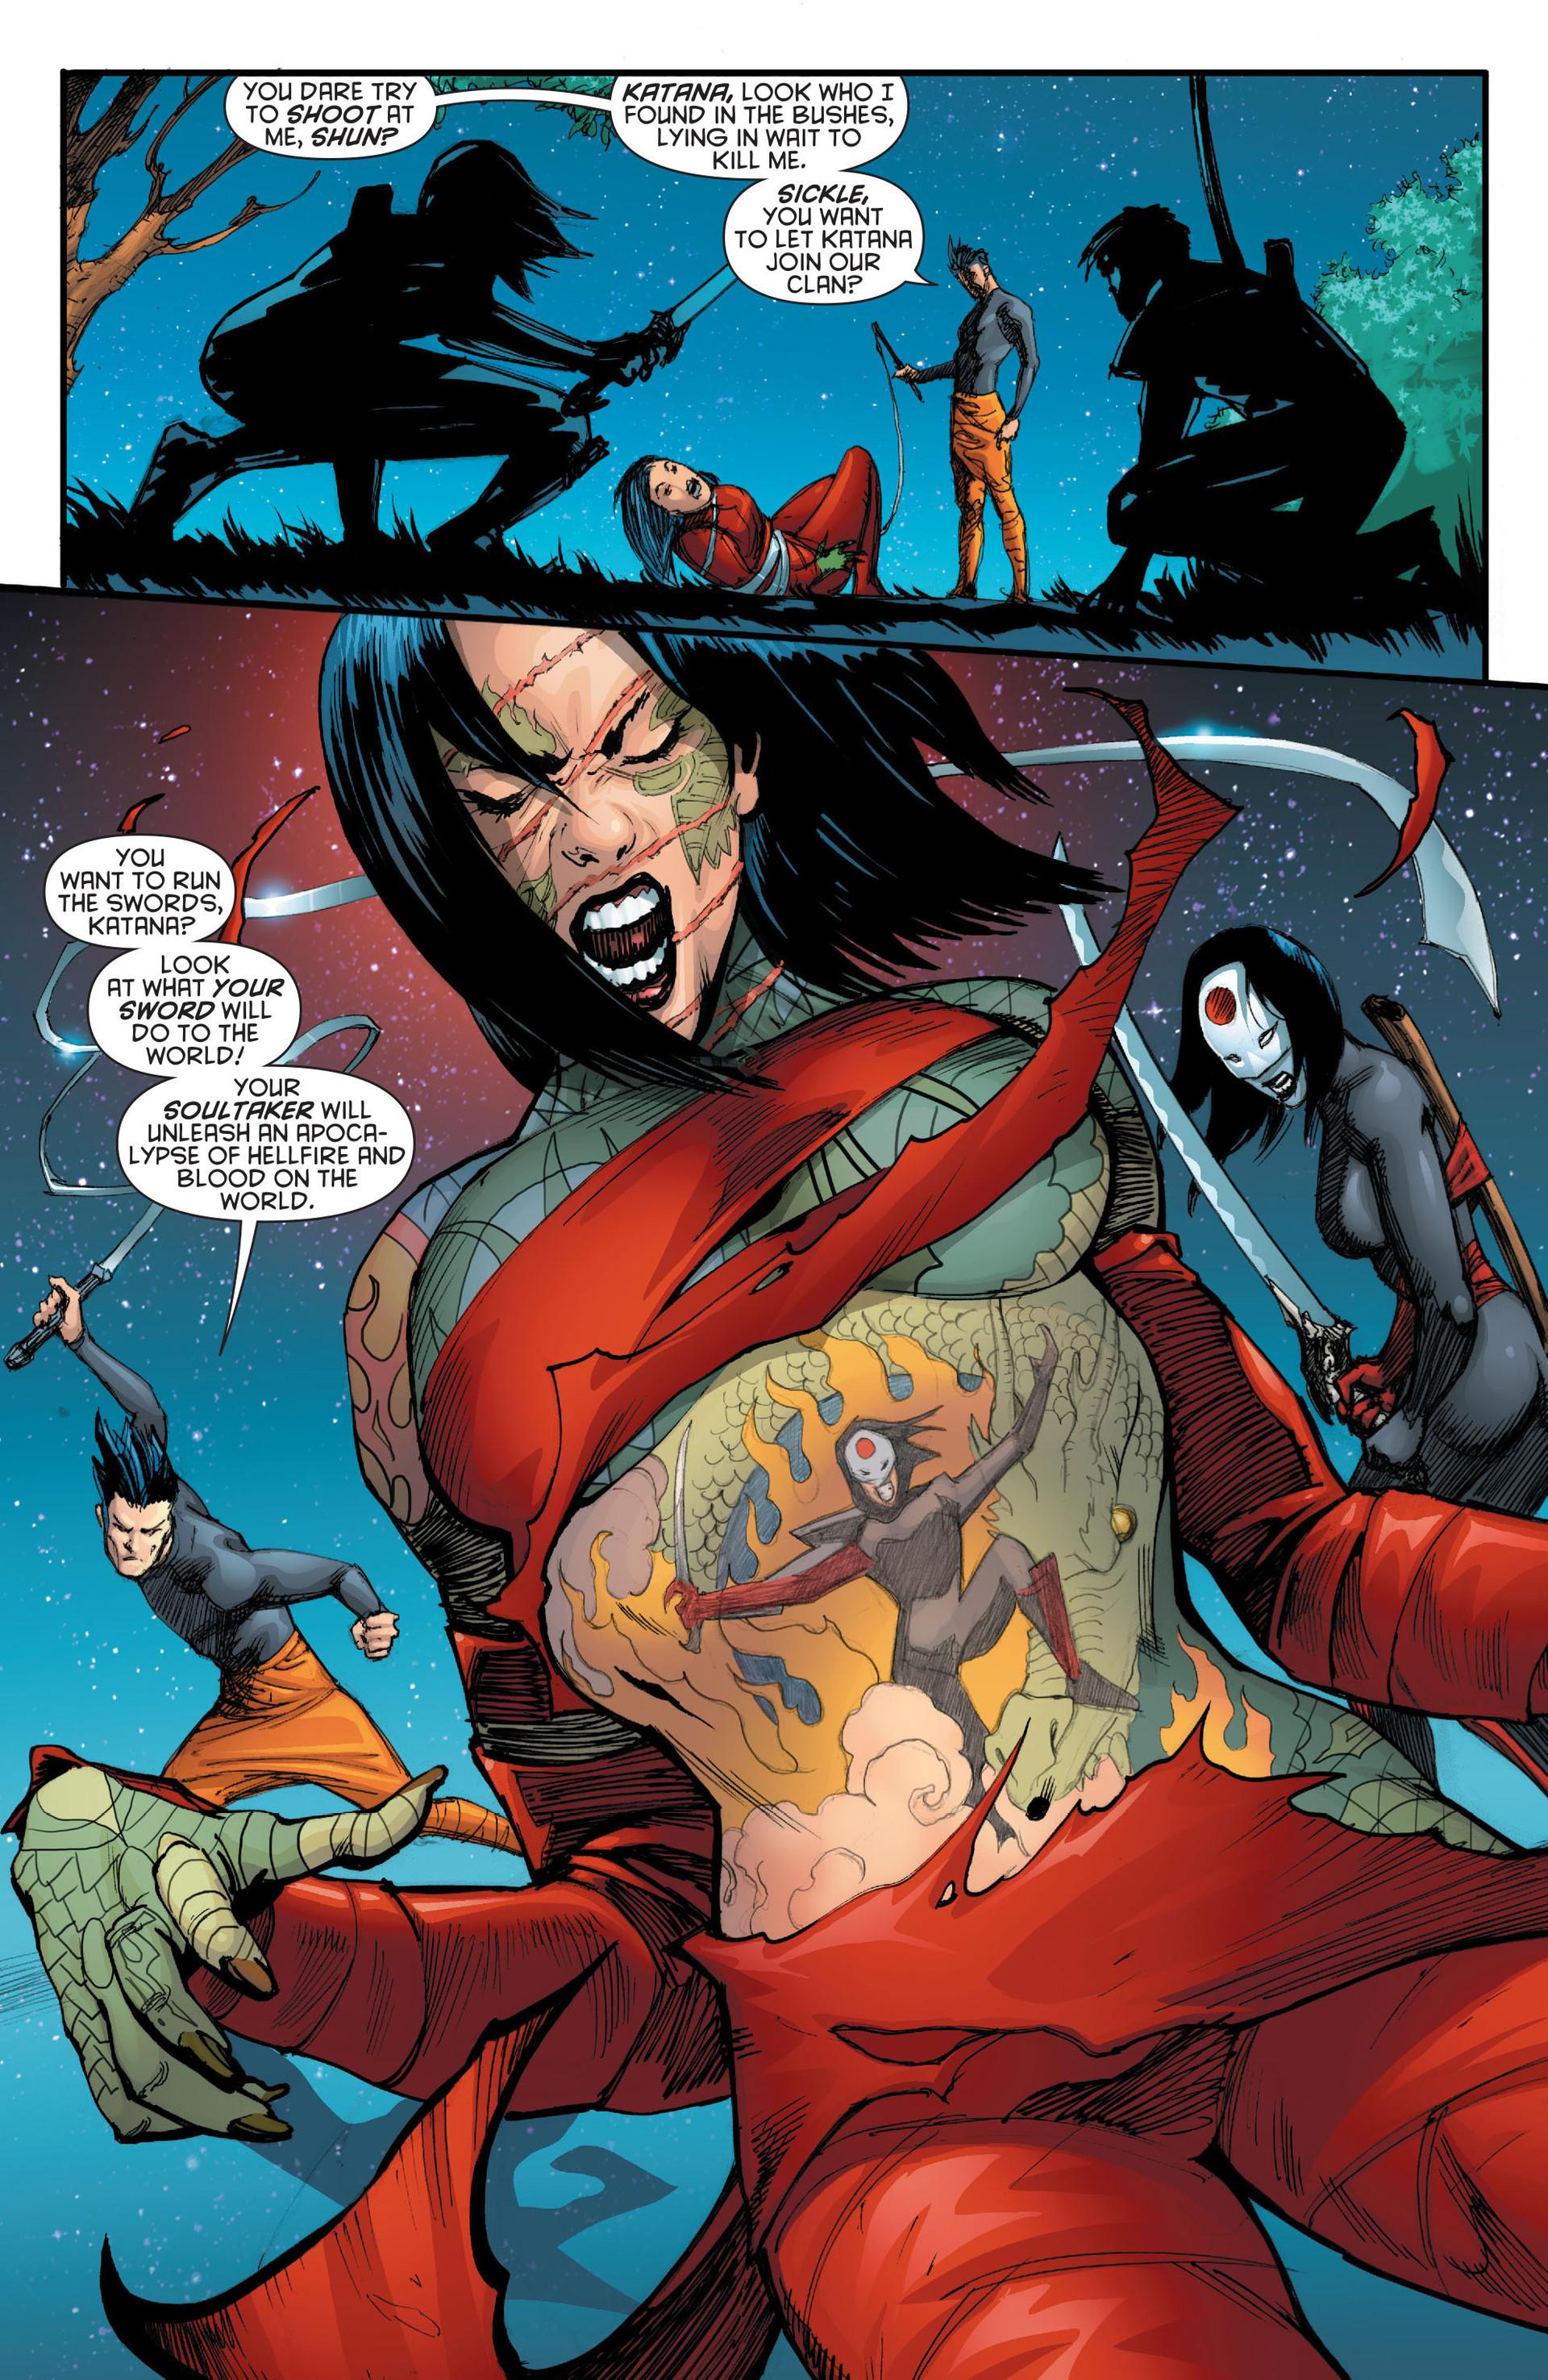 Read online Katana comic -  Issue #7 - 19